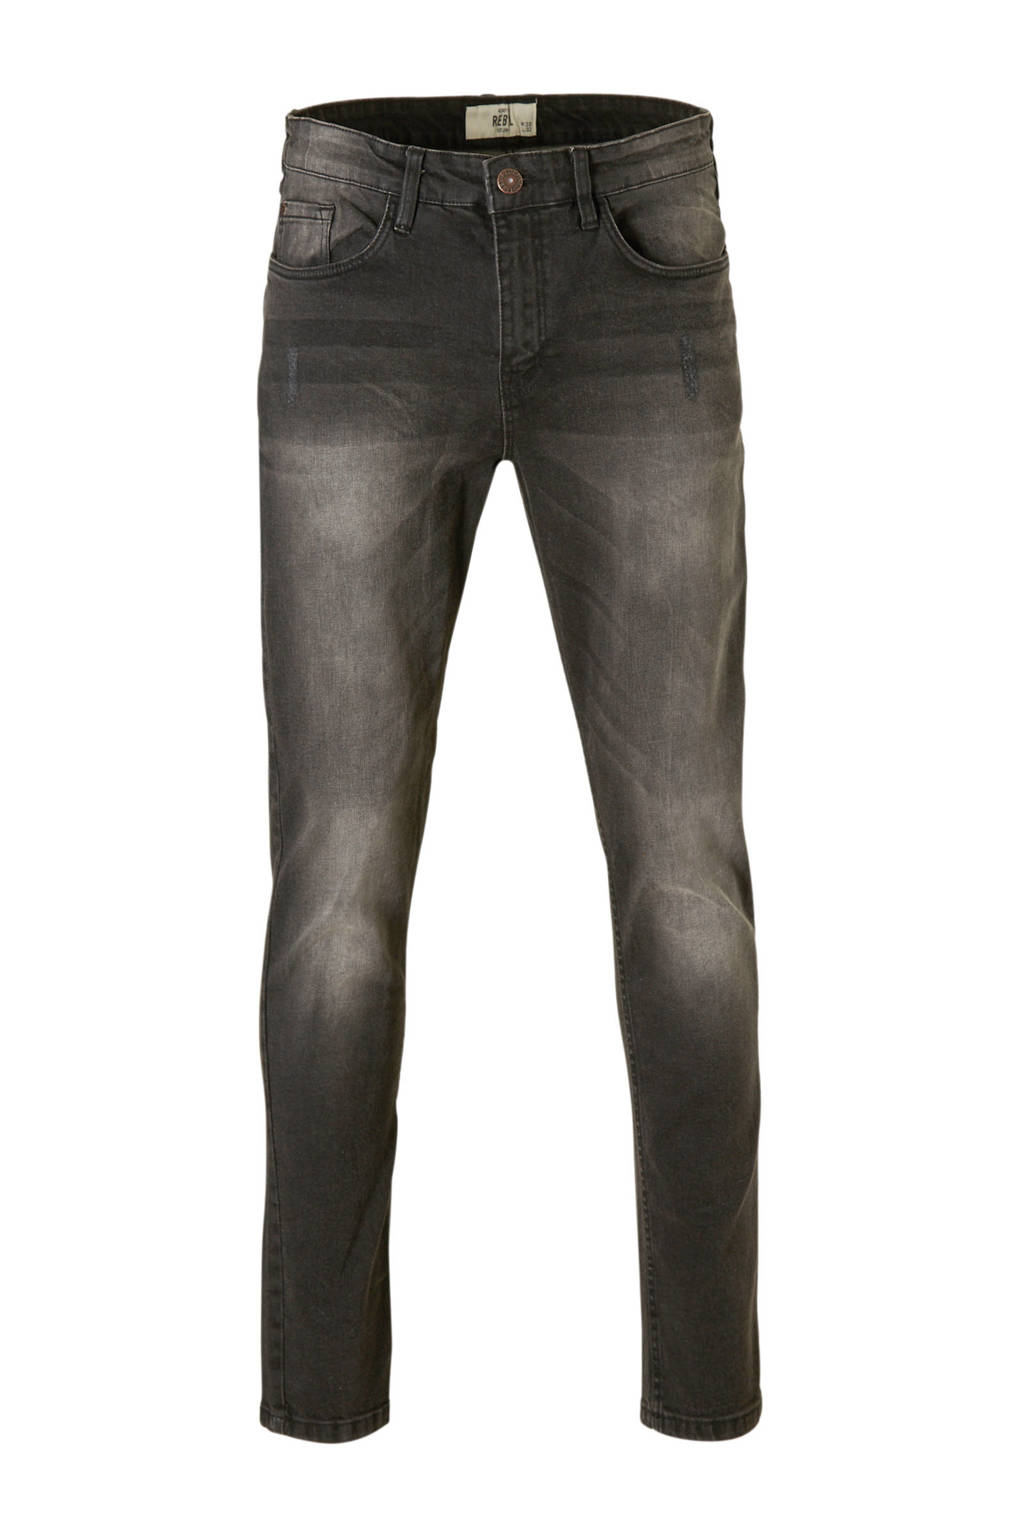 Redefined Rebel slim fit jeans Florence, Black Stone